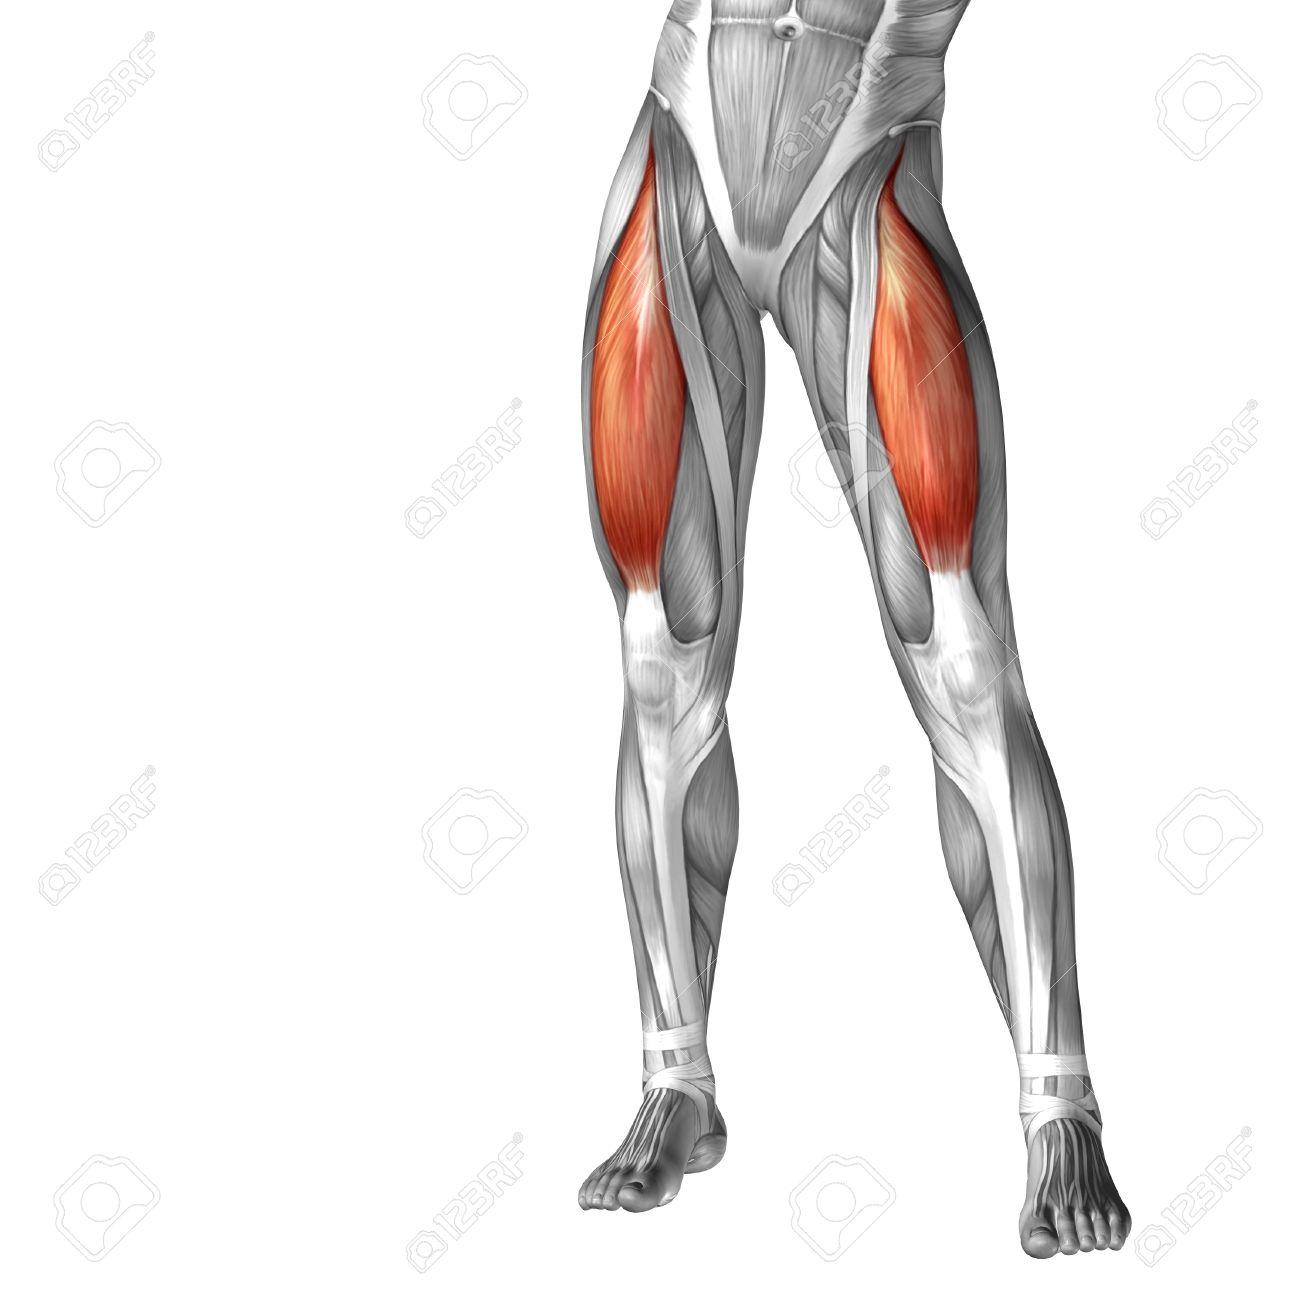 Funky Leg Muscles Anatomy Frieze - Human Anatomy Images ...